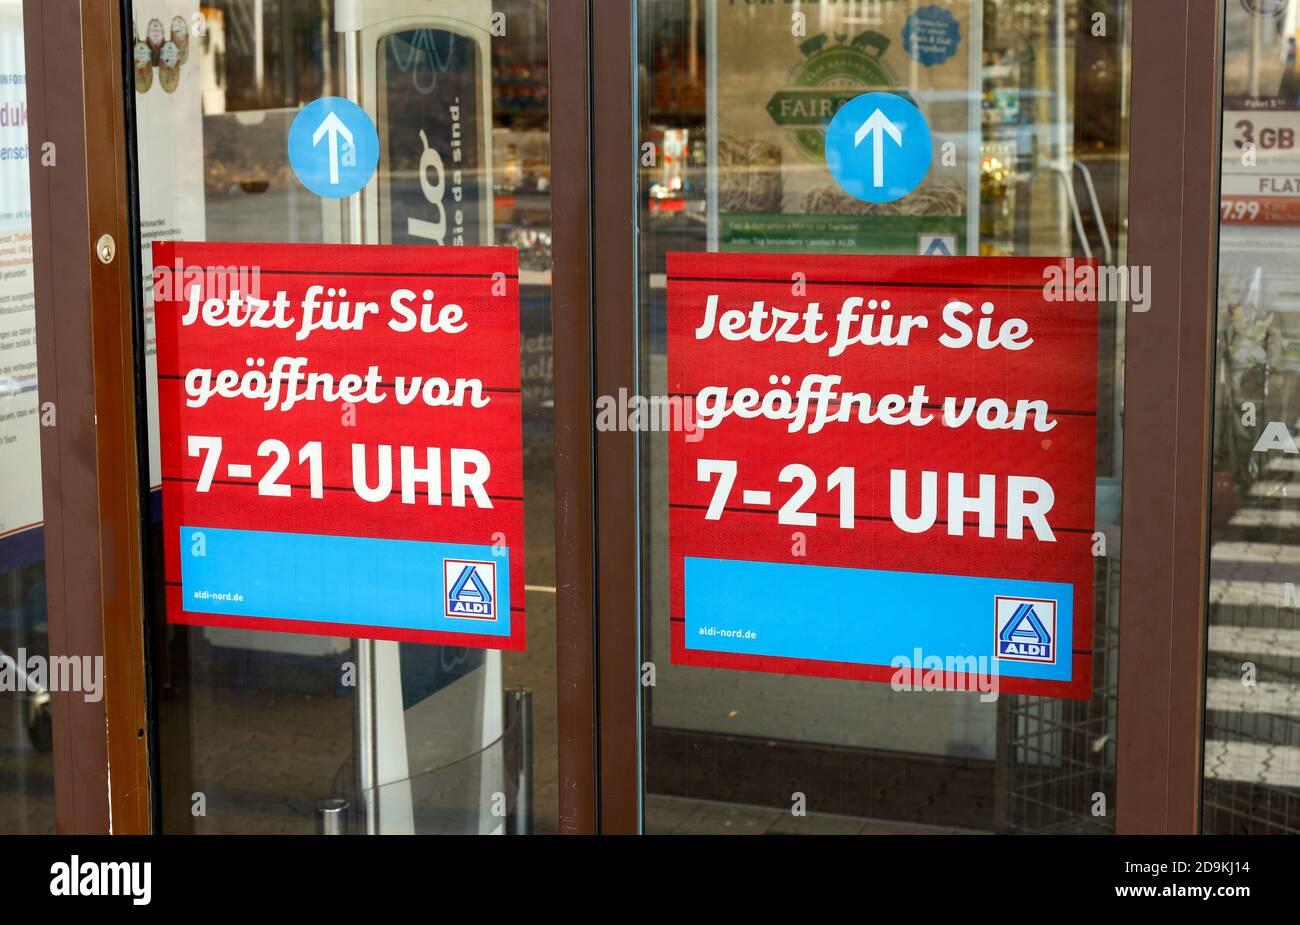 Opening hours, Aldi-Nord supermarket, Datteln, North Rhine-Westphalia, Germany Stock Photo